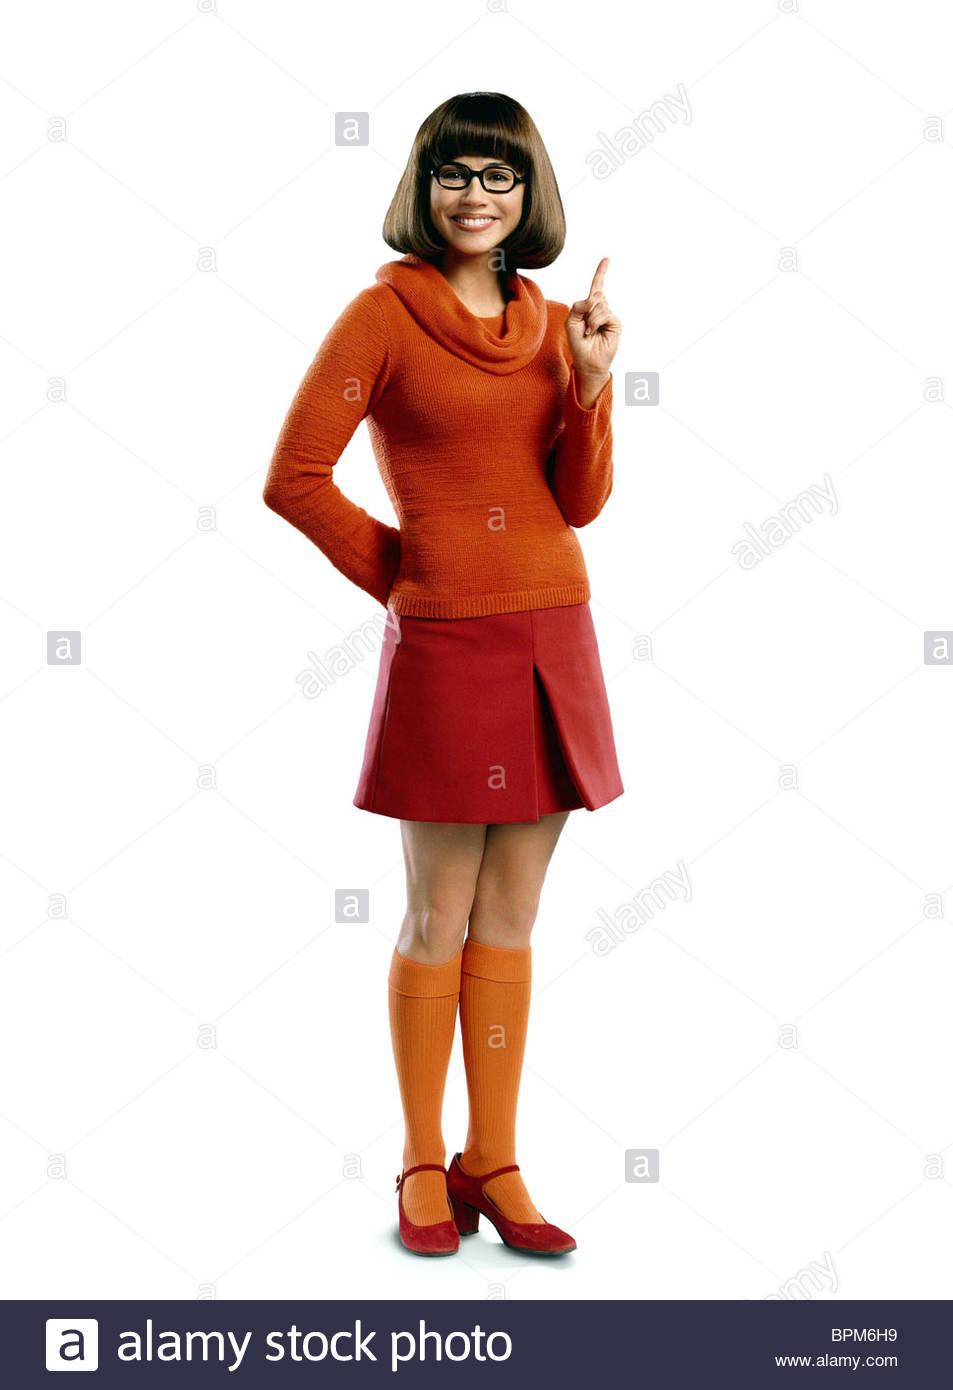 Linda Cardellini Scooby Doo 2 Monsters Unleashed 2004 Stock Photo Alamy